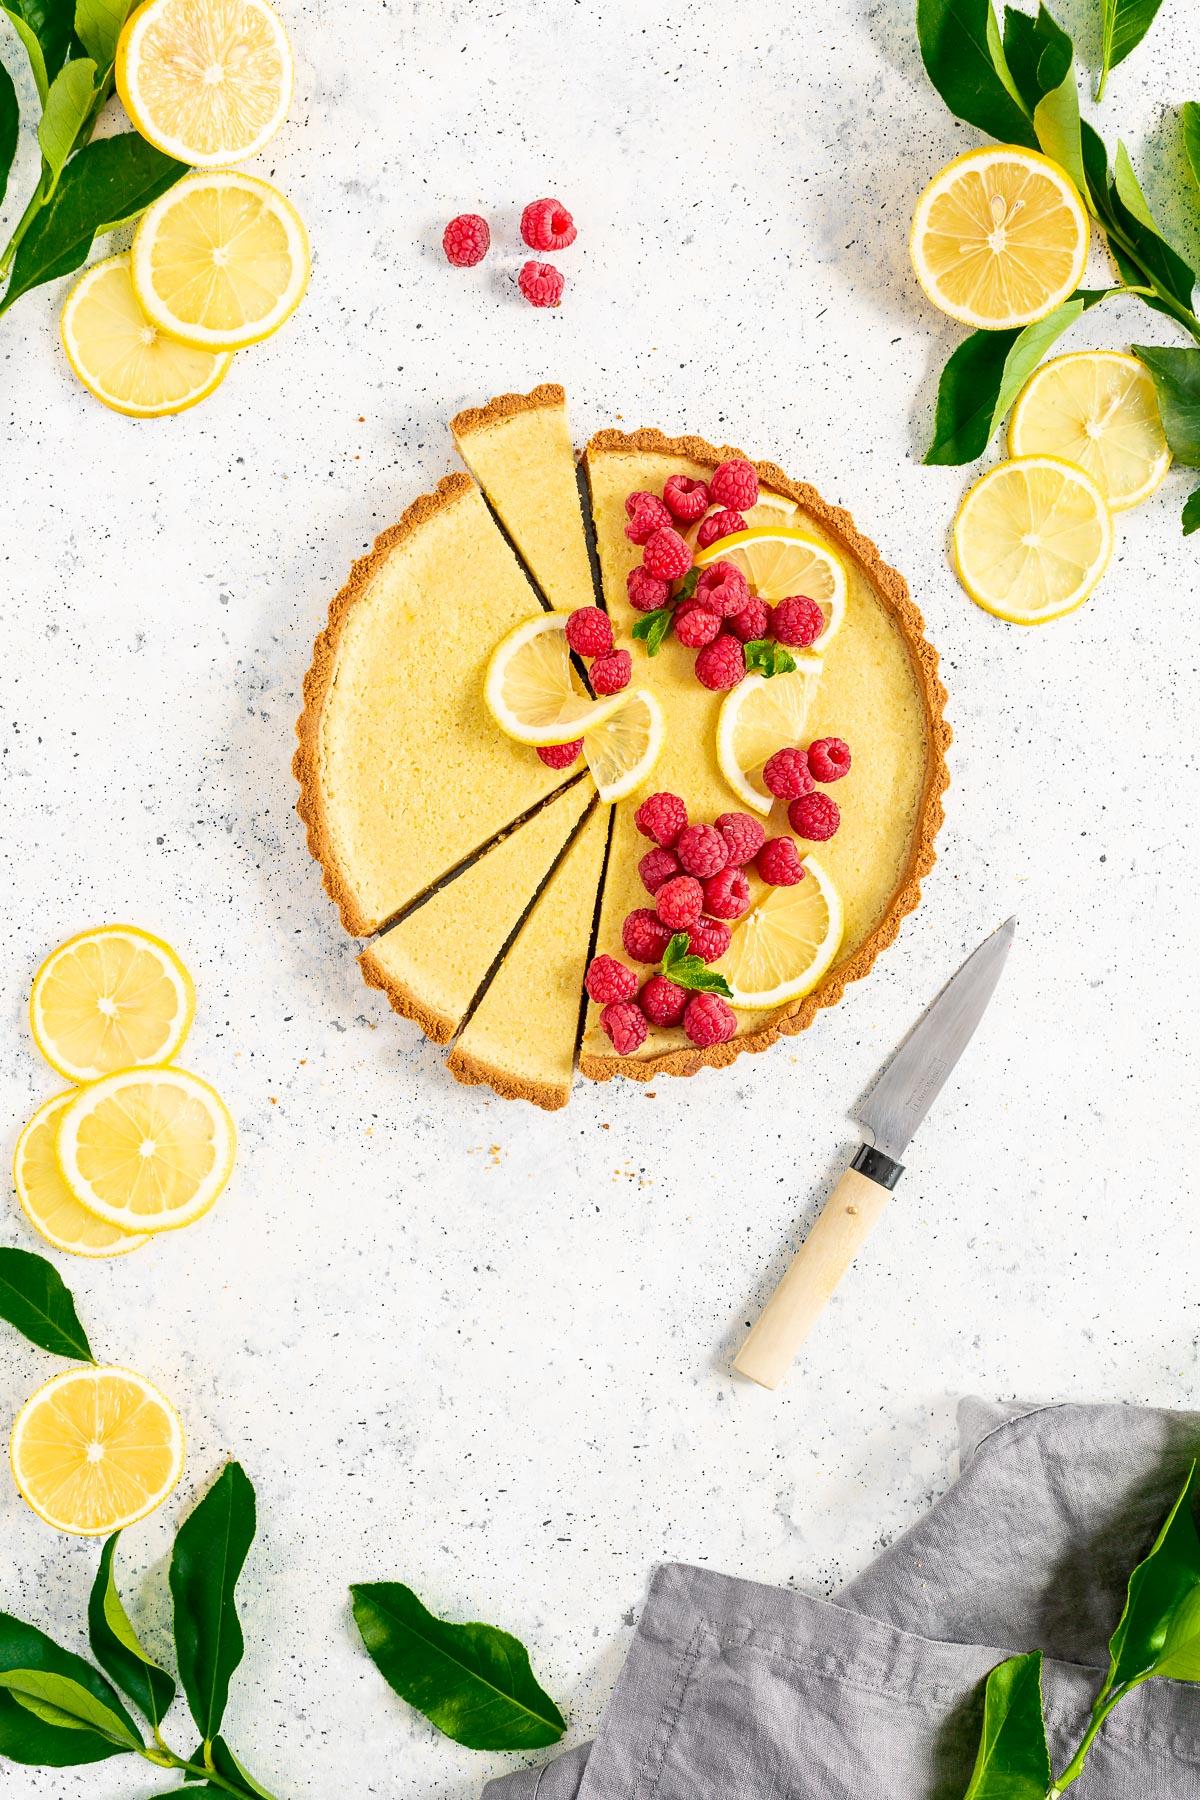 CROSTATA al LIMONE VEGAN con pasta FROLLA ALLE MANDORLE senza glutine Refined Sugar-Free Gluten-Free Vegan Lemon Tart with Almond Crust